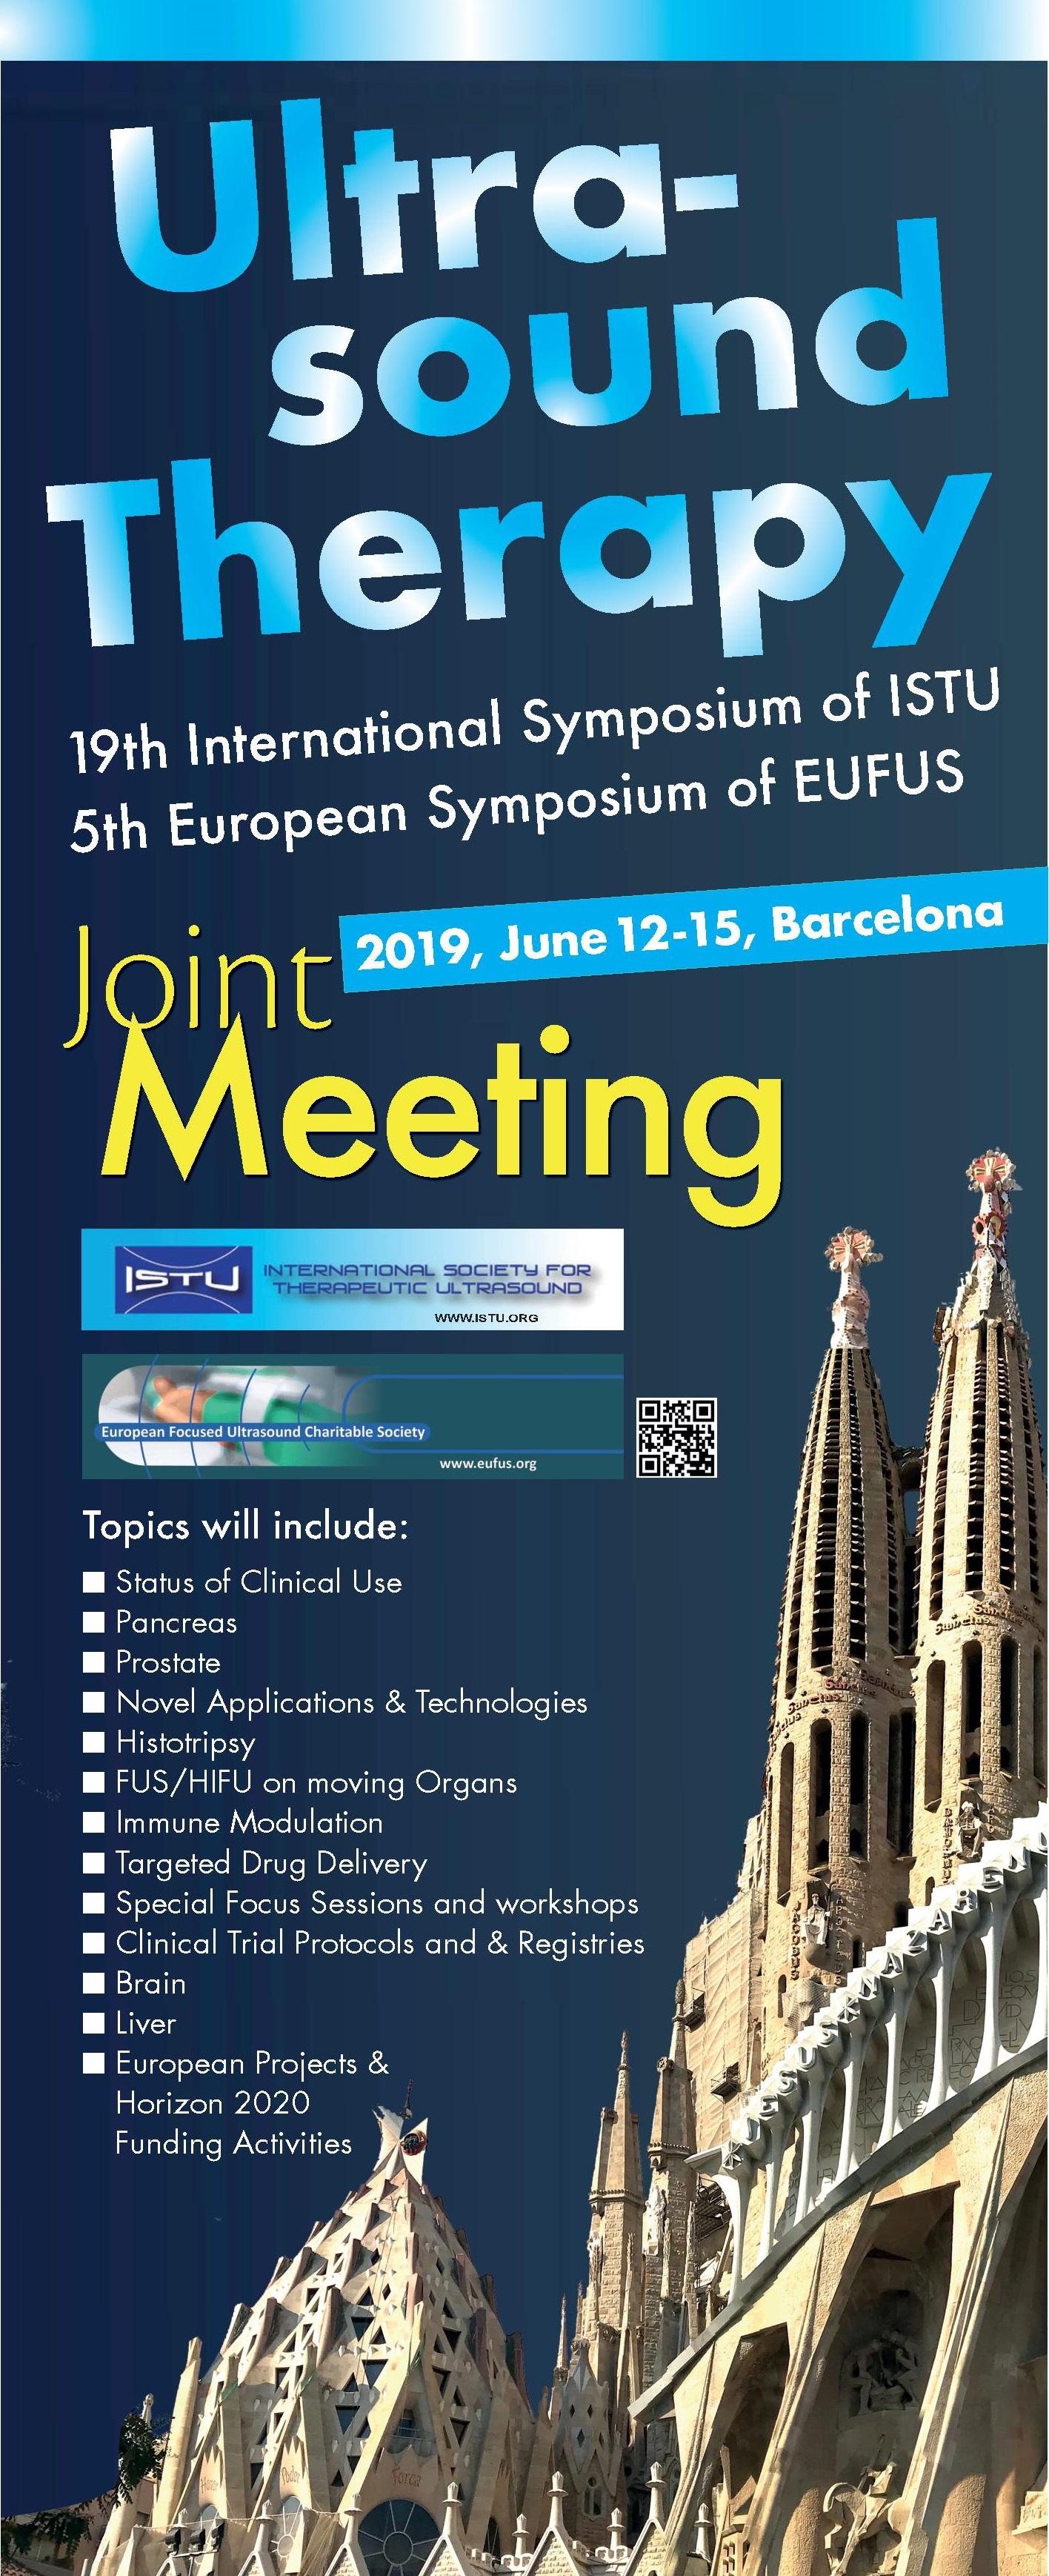 EUFUS Barcelona, June 12-15, 2019